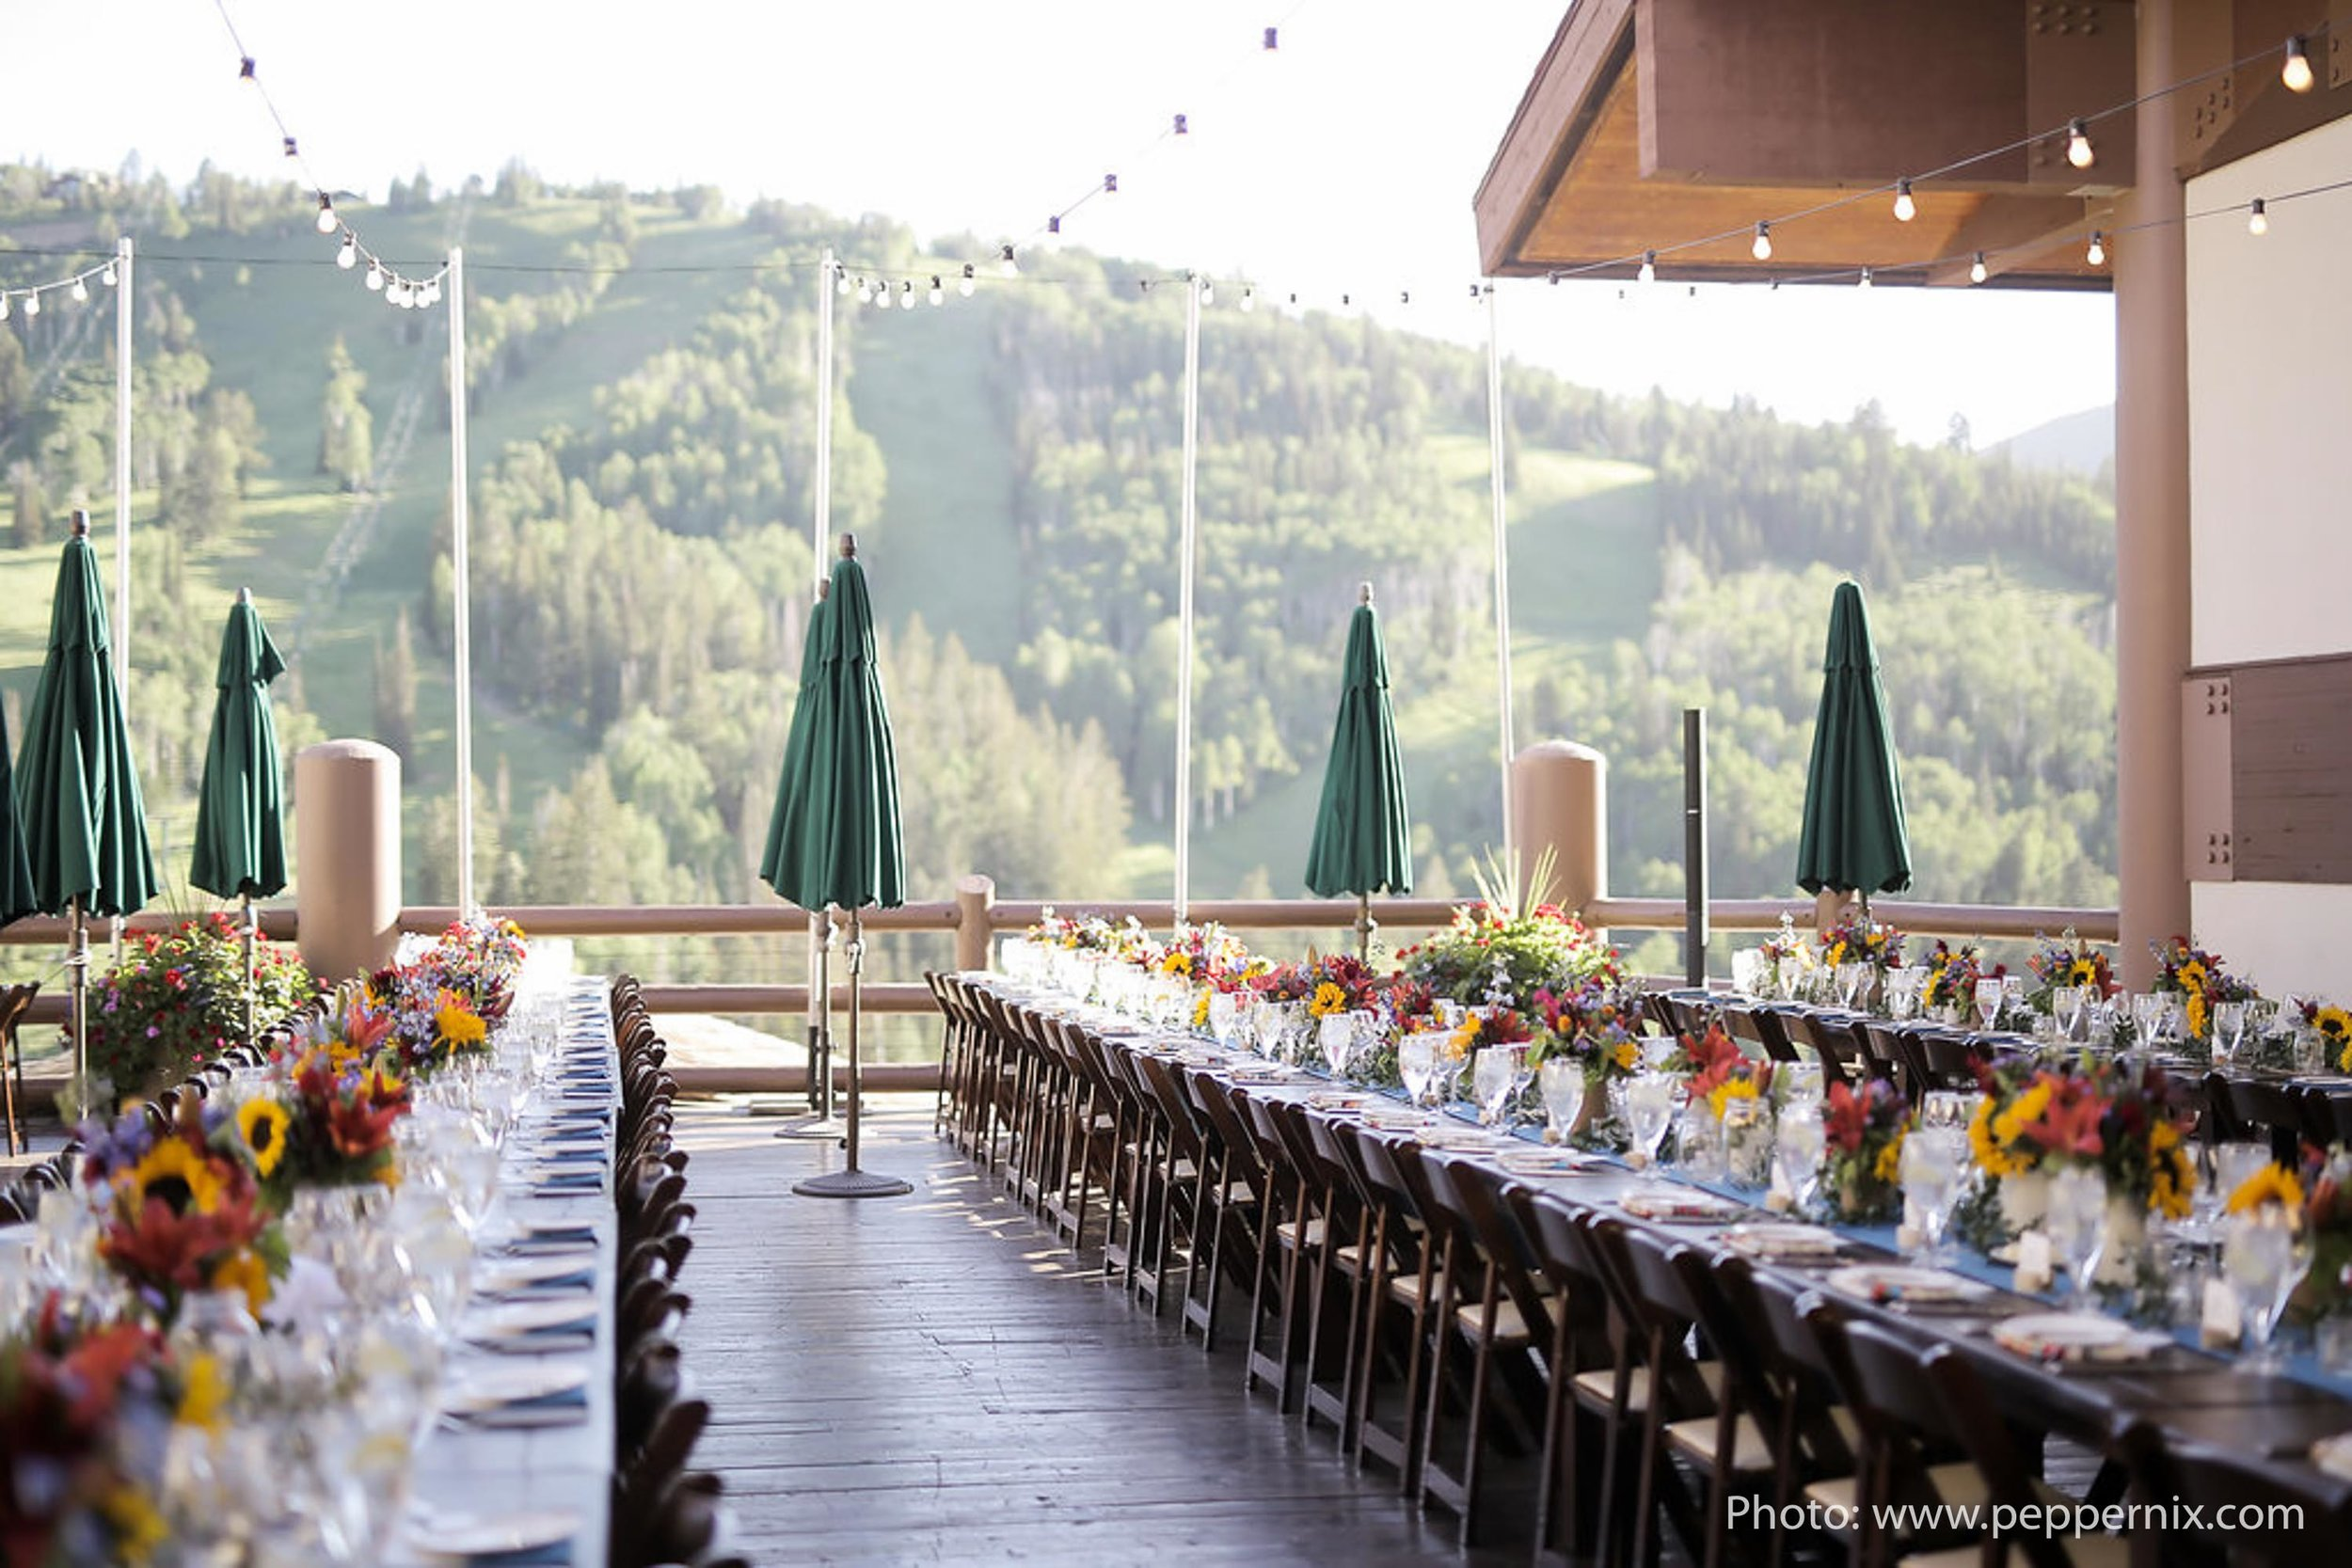 Summer Weddings shabbat Park City PNP Eriksen Lodge-0403.jpg